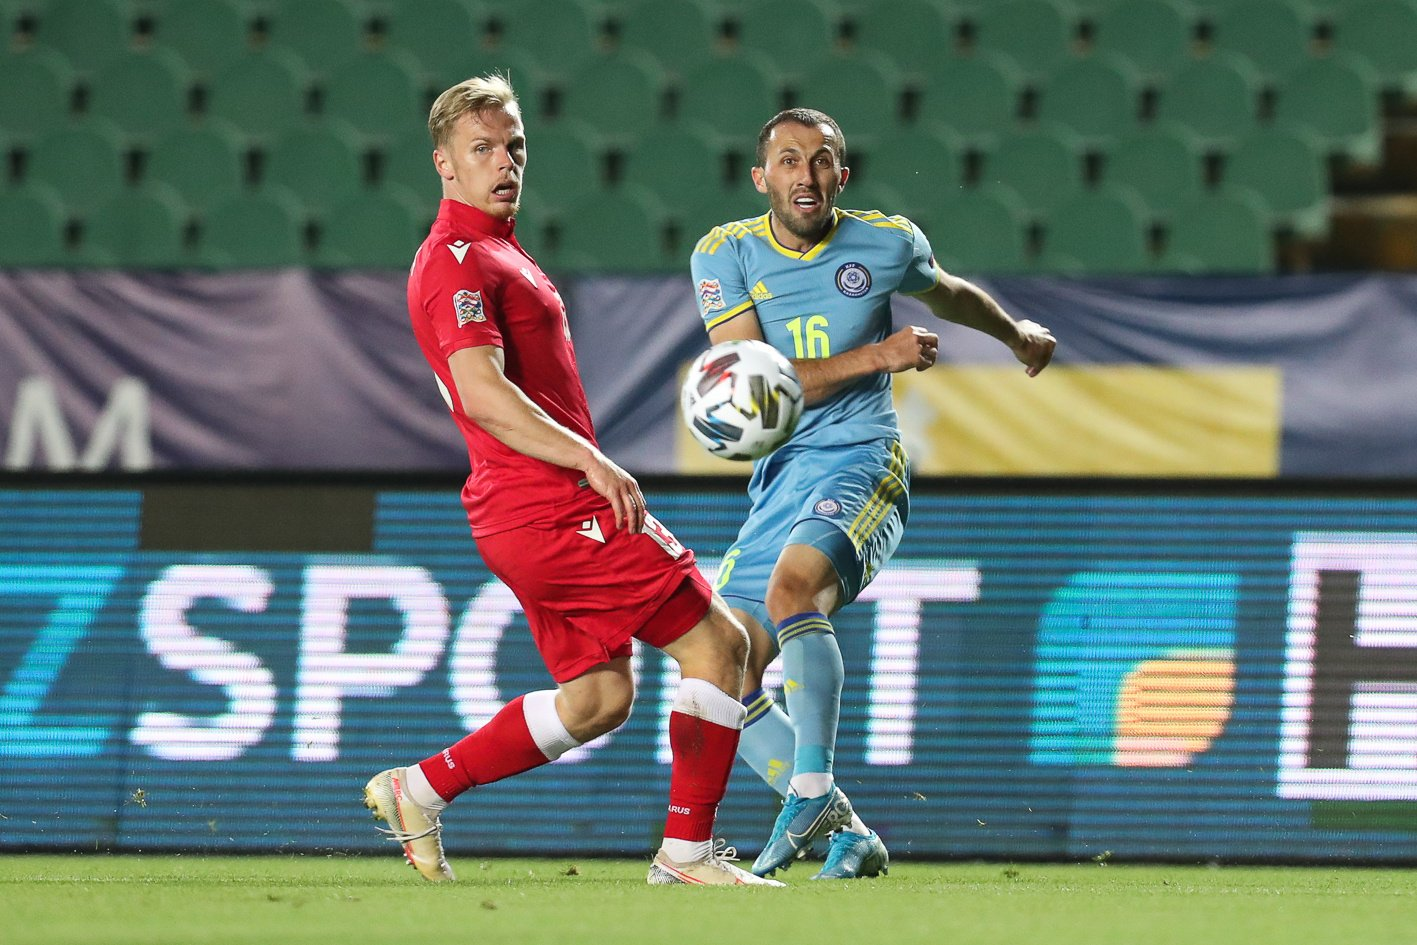 Гол Лисаковича принес Беларуси победу над Казахстаном